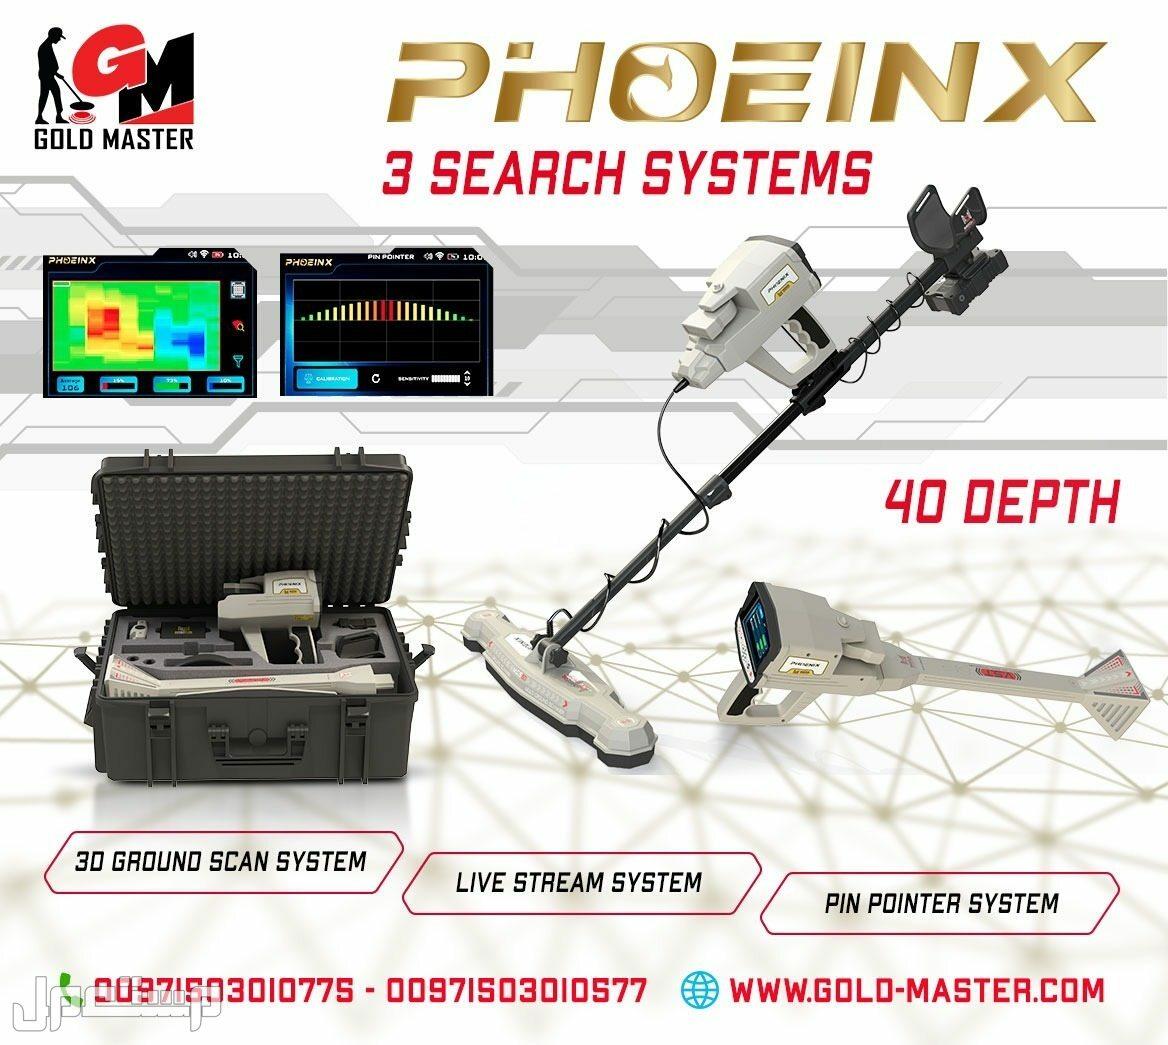 phoenix جهاز كشف الذهب والمعادن التصويري ثلاثي الابعاد جهاز كشف الذهب